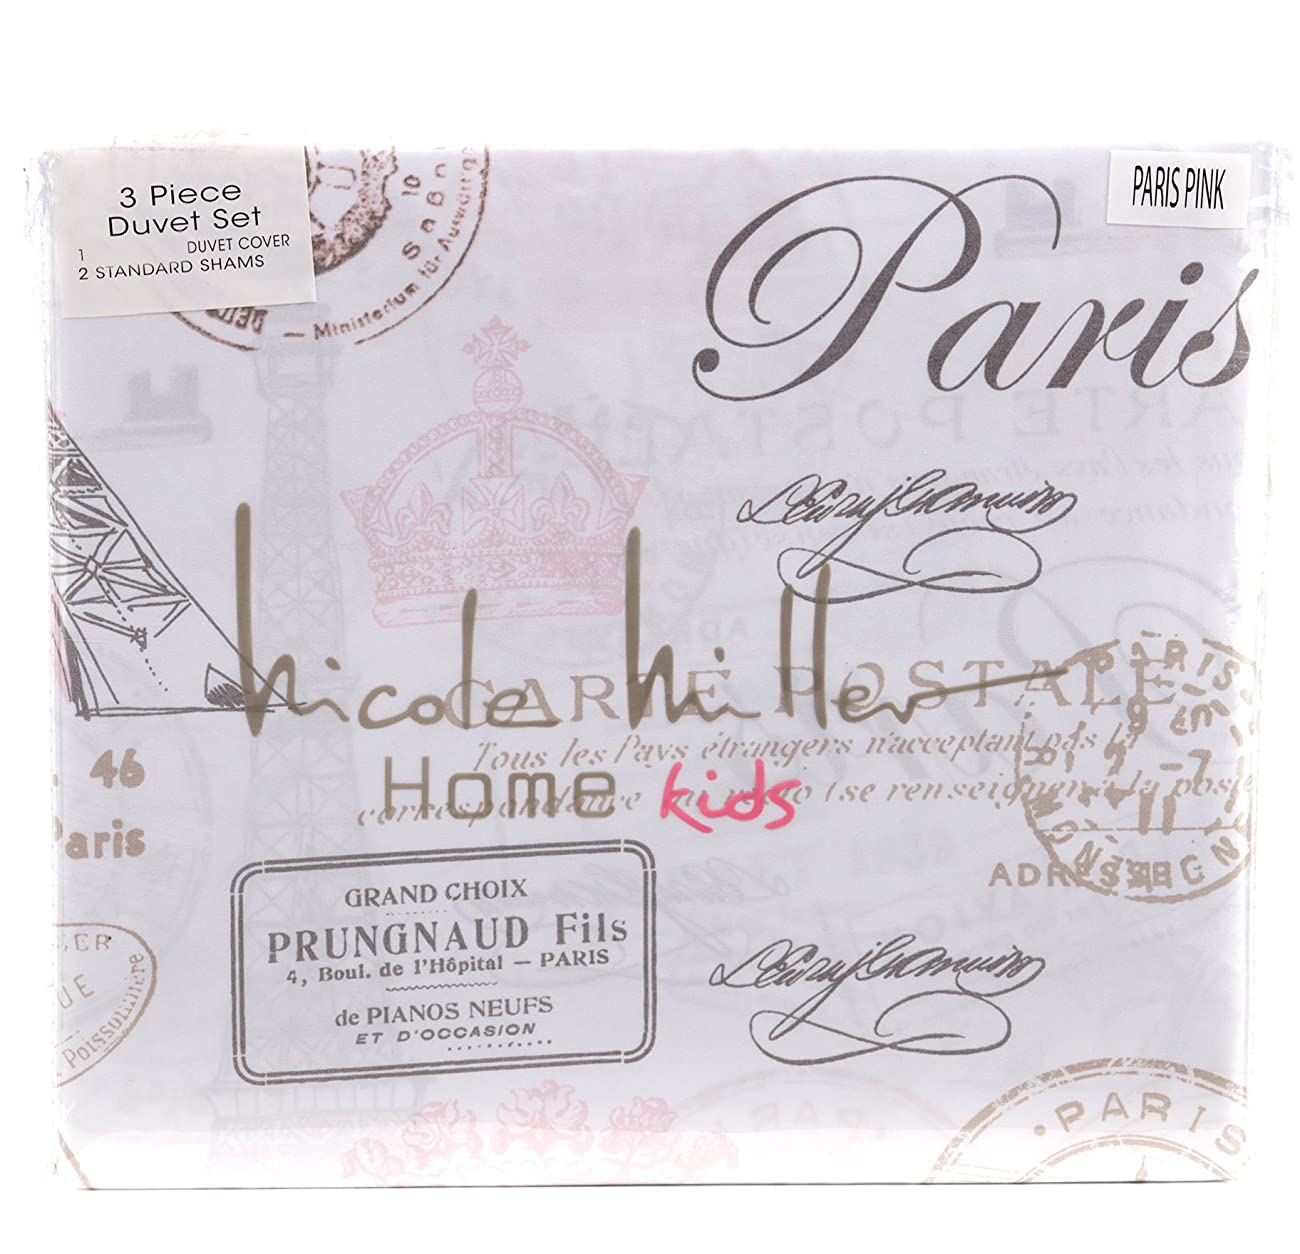 Paris French Vintage Duvet Quilt Cover by Designer Nicole Miller, Bedding Set Grey Tan Dusty Rose Pink Eiffel Script Parisian Theme on White (Queen) 1